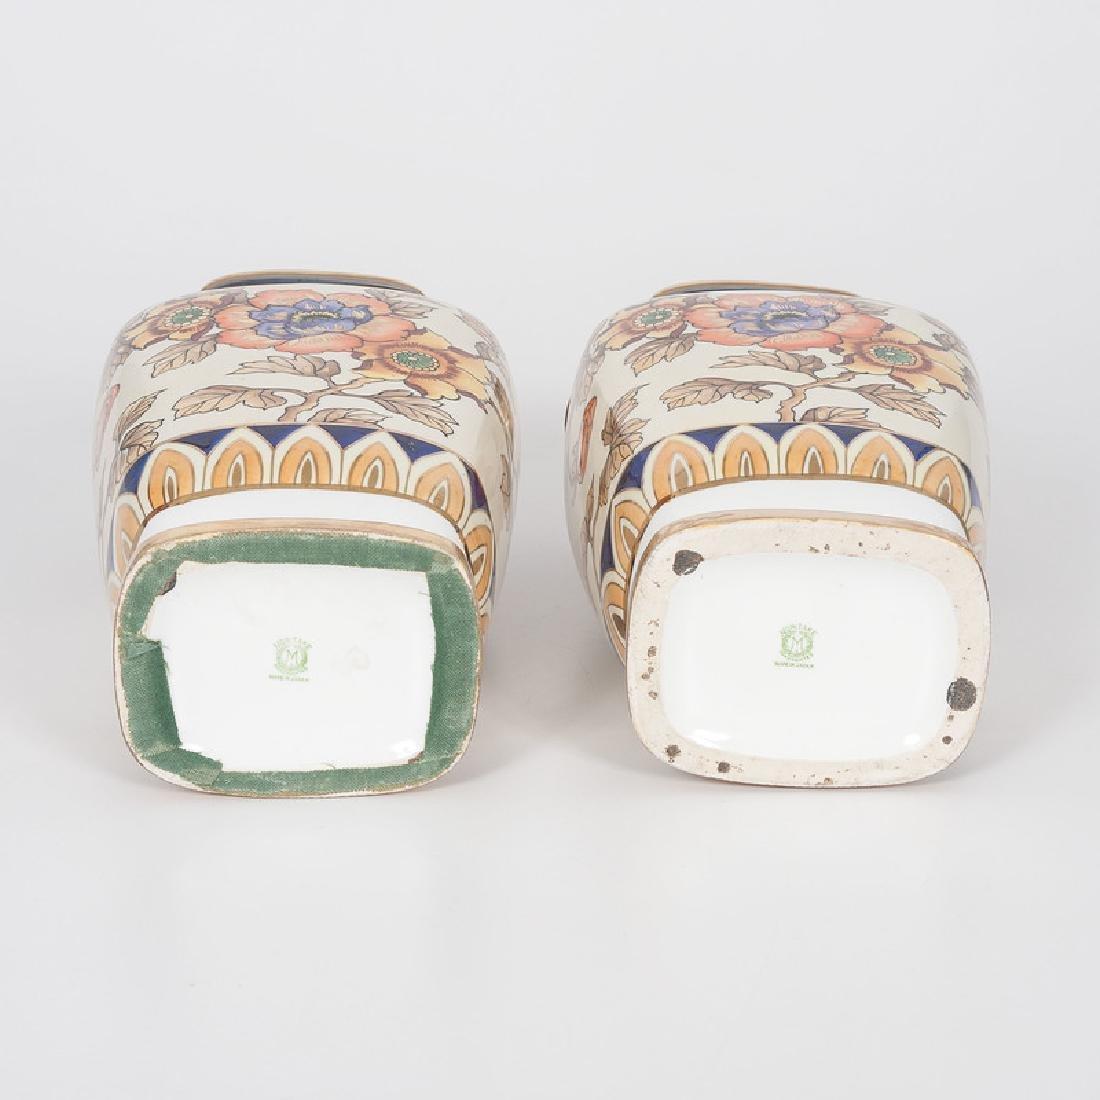 Noritake Hand-Painted Vases - 6